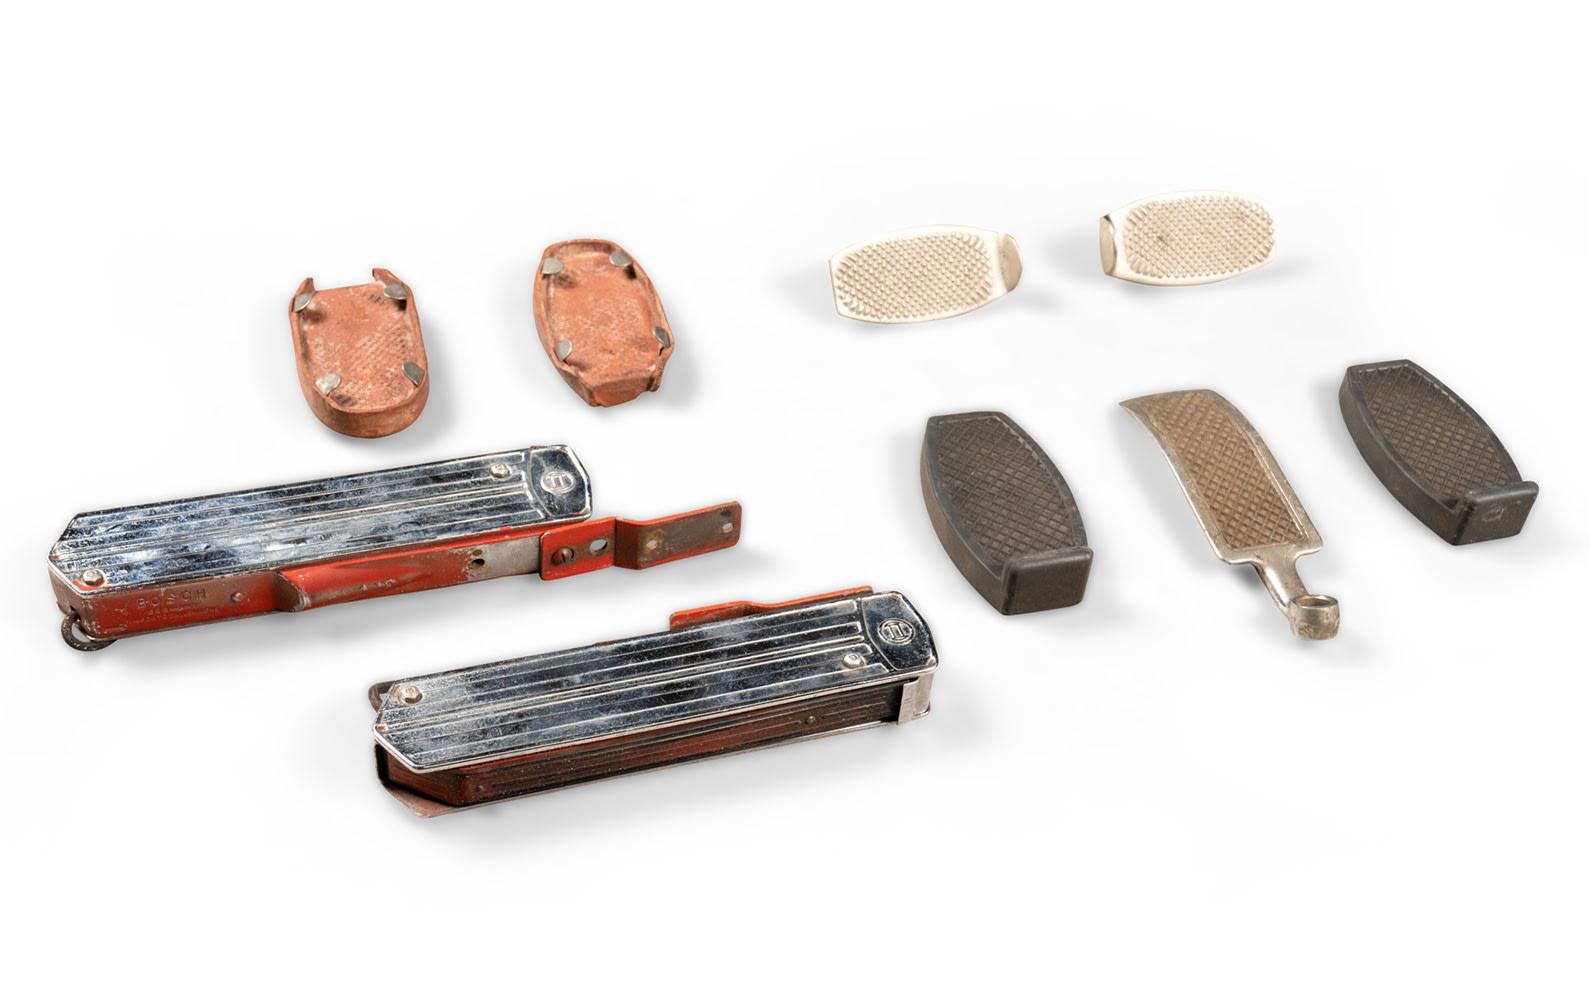 Prod/O21E - Phil Hill C 2021/C0061_Bosch Semaphores, Accelerator, Clutch and Brake Pedal Parts/C0061_Bosch_Semaphores_Accelerator_Clutch_Brake_Parts_2_dh8ccp